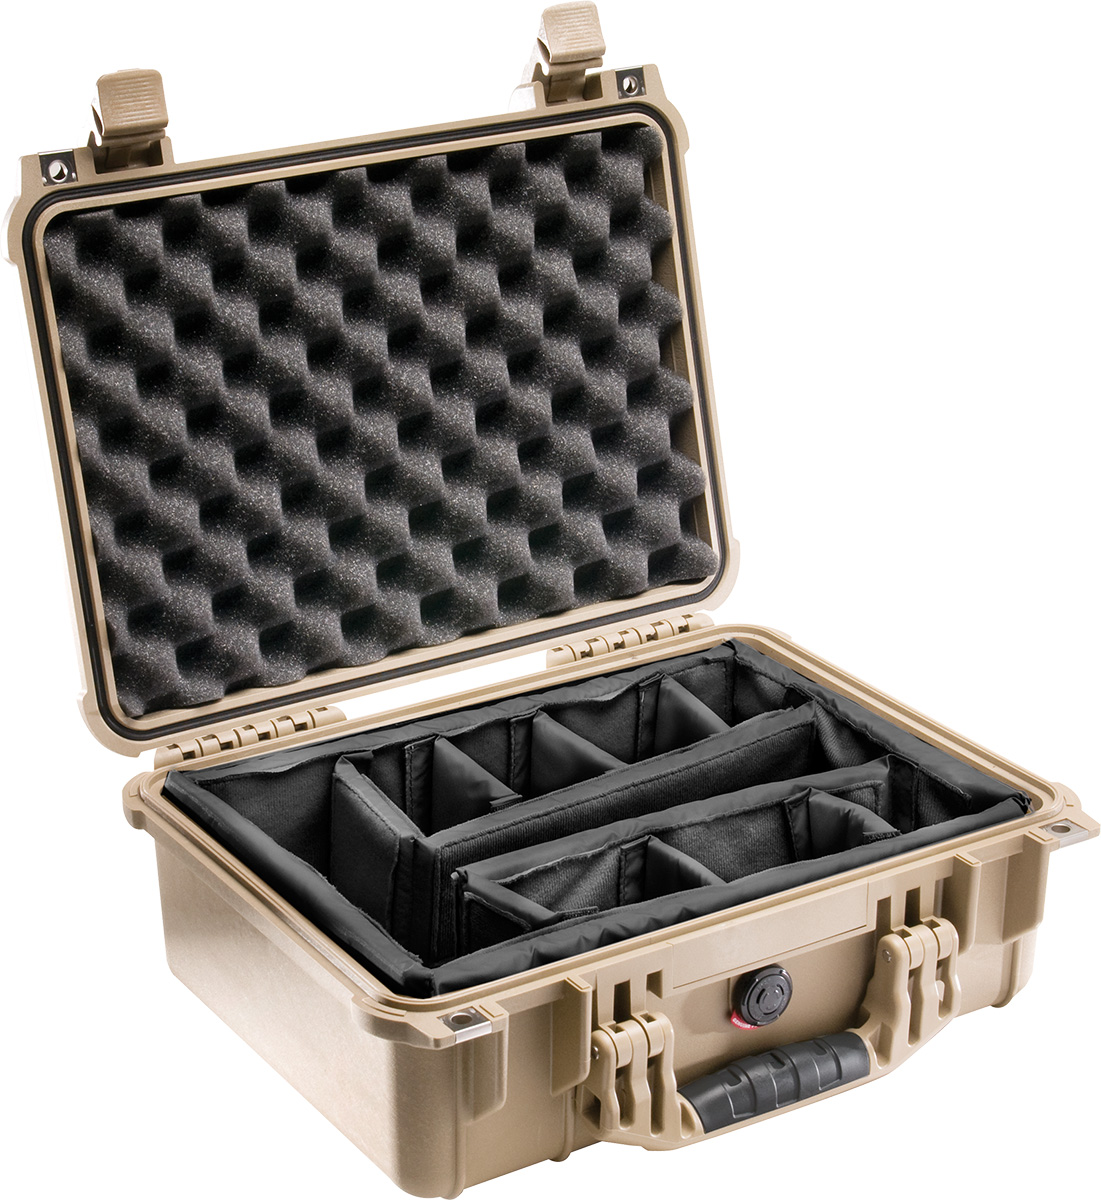 pelican 1450 1454 watertight protector case